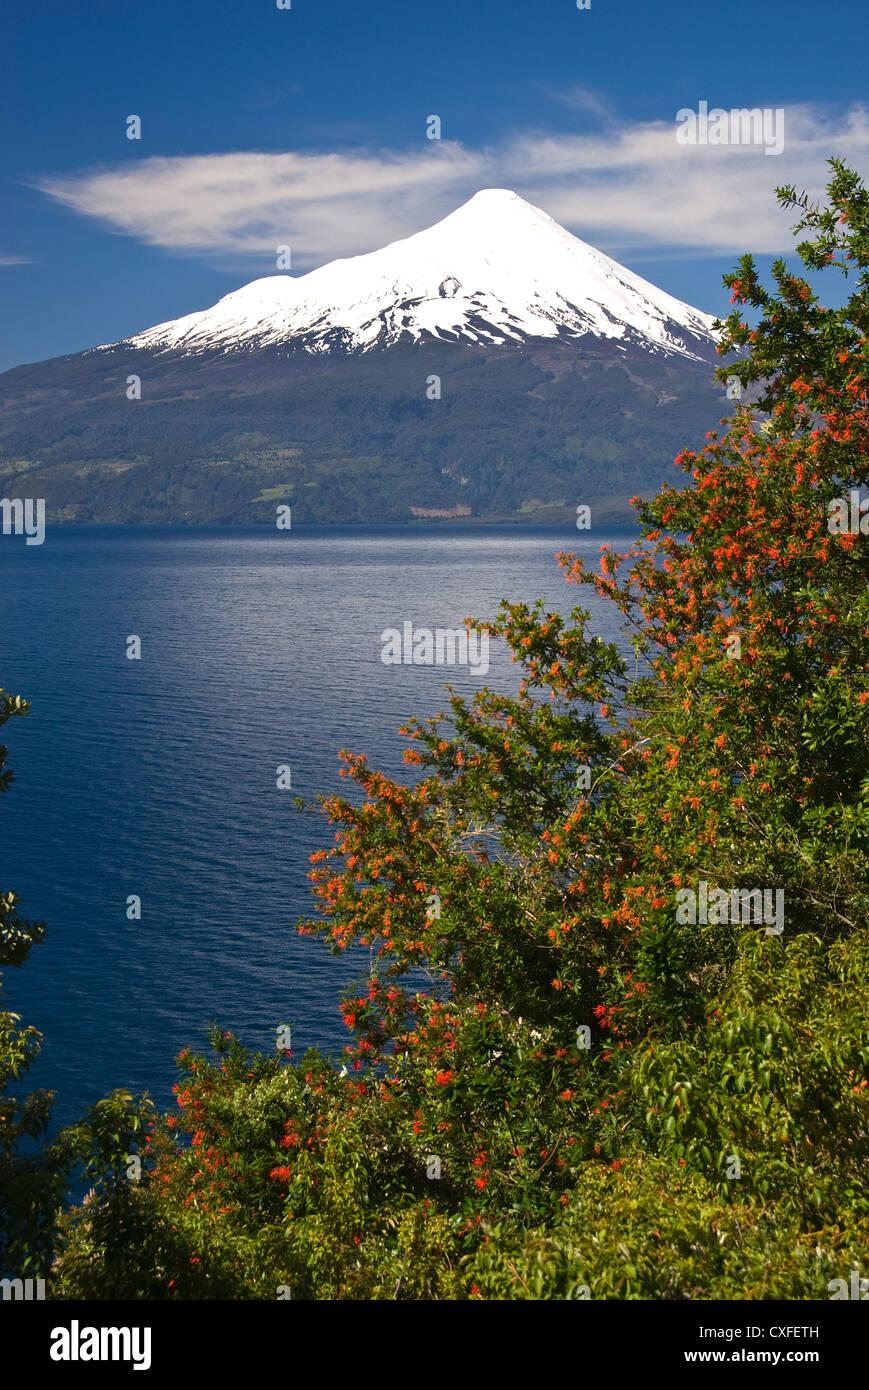 Elk198-3506v Chile, Lago Llanquihue lake, Volcan Osorno Stock Photo